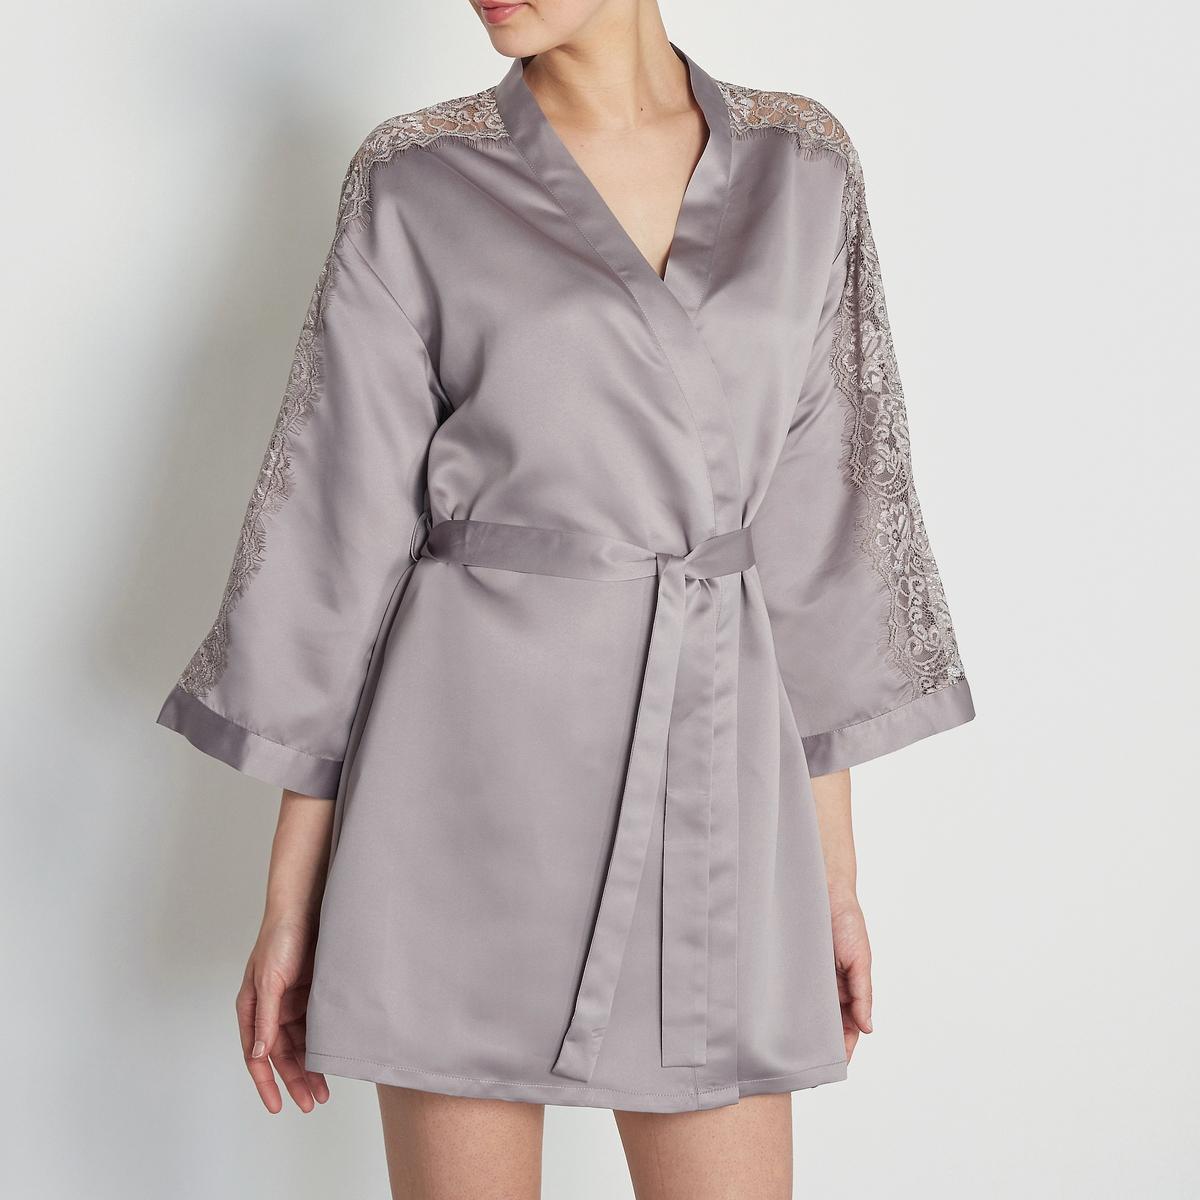 LOUISE MARNAY Халат-кимоно из атласа и кружева